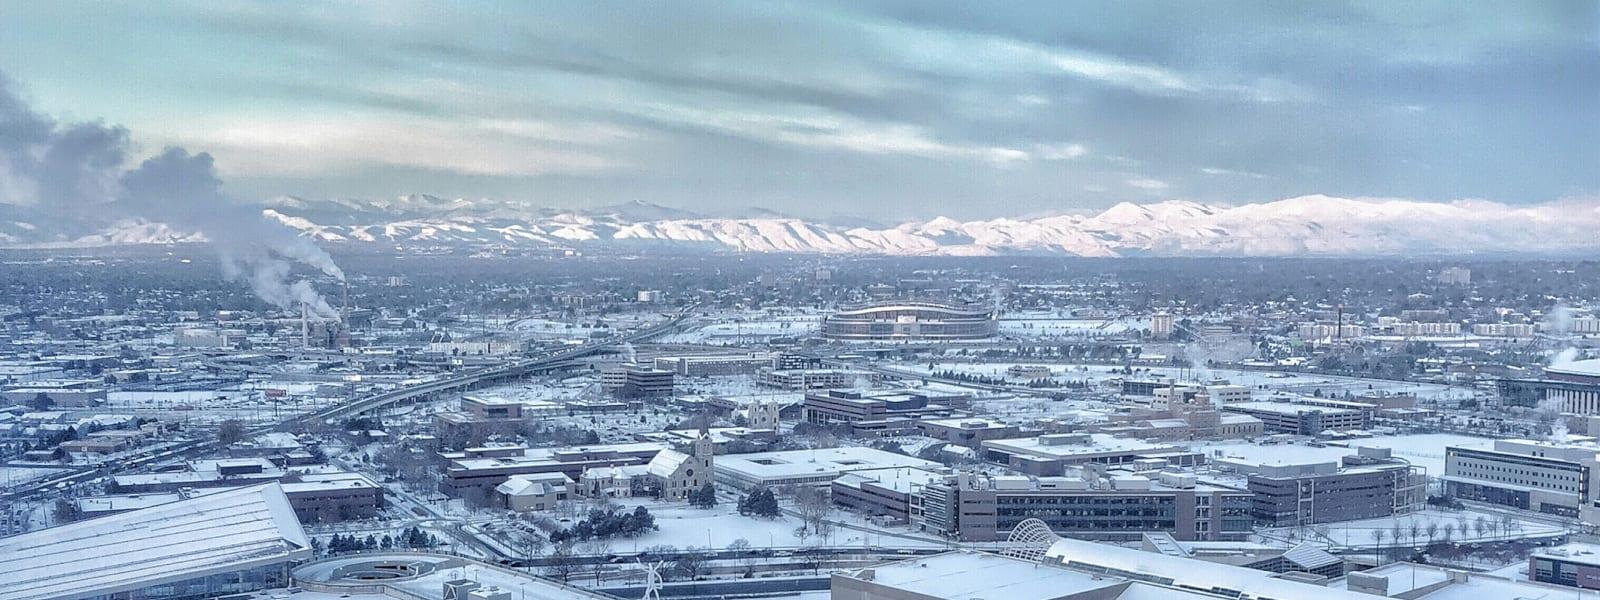 Denver Travel Destination Snow Covered Rocky Mountains Hyatt Regency Lounge View